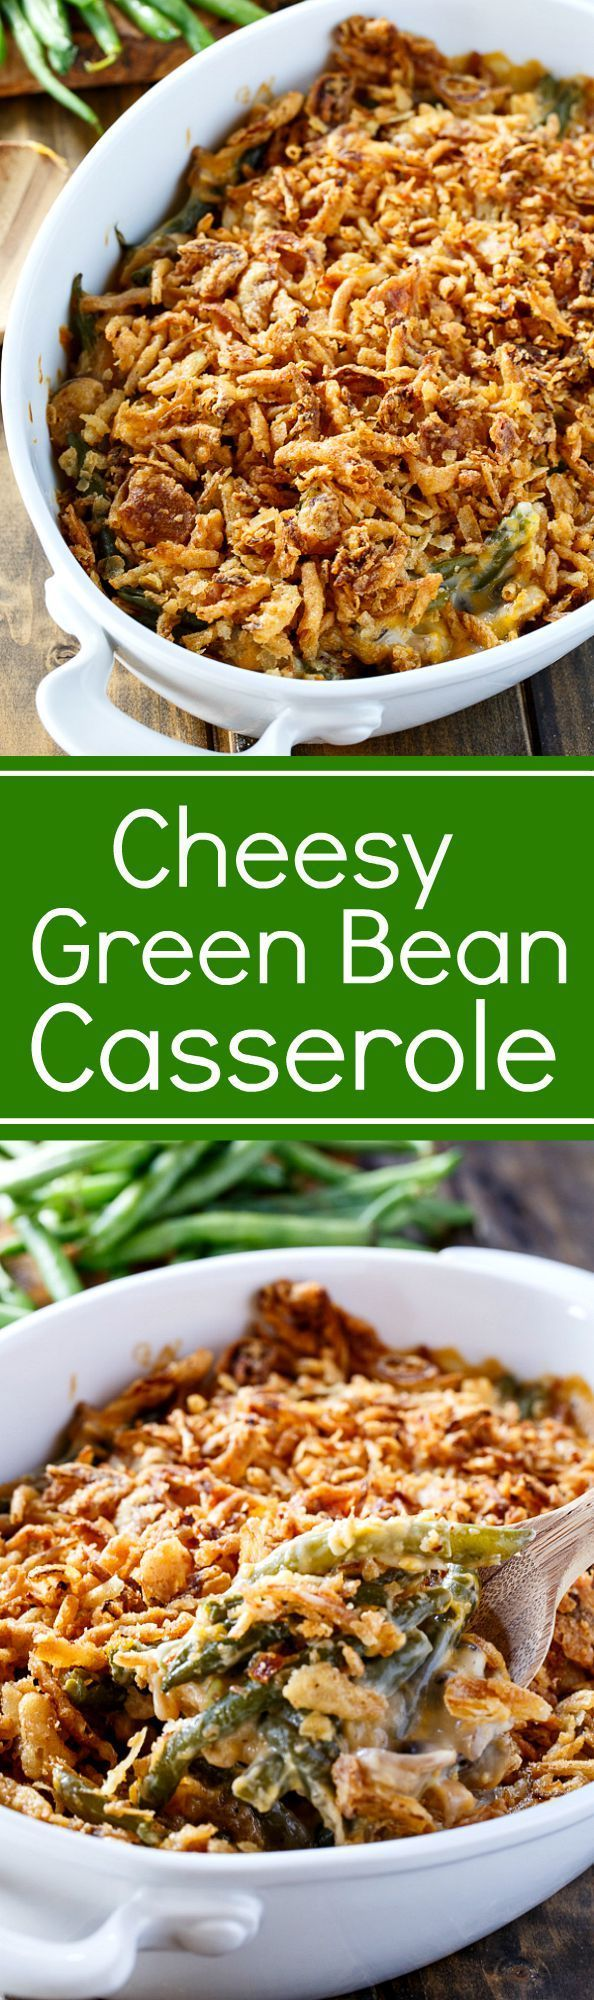 The Best Baked Pork Chop Casserole Recipes on Yummly | Pork Chop And Potato Casserole, Pork Chop And Potato Casserole, Pork Chop And Potato Casserole.